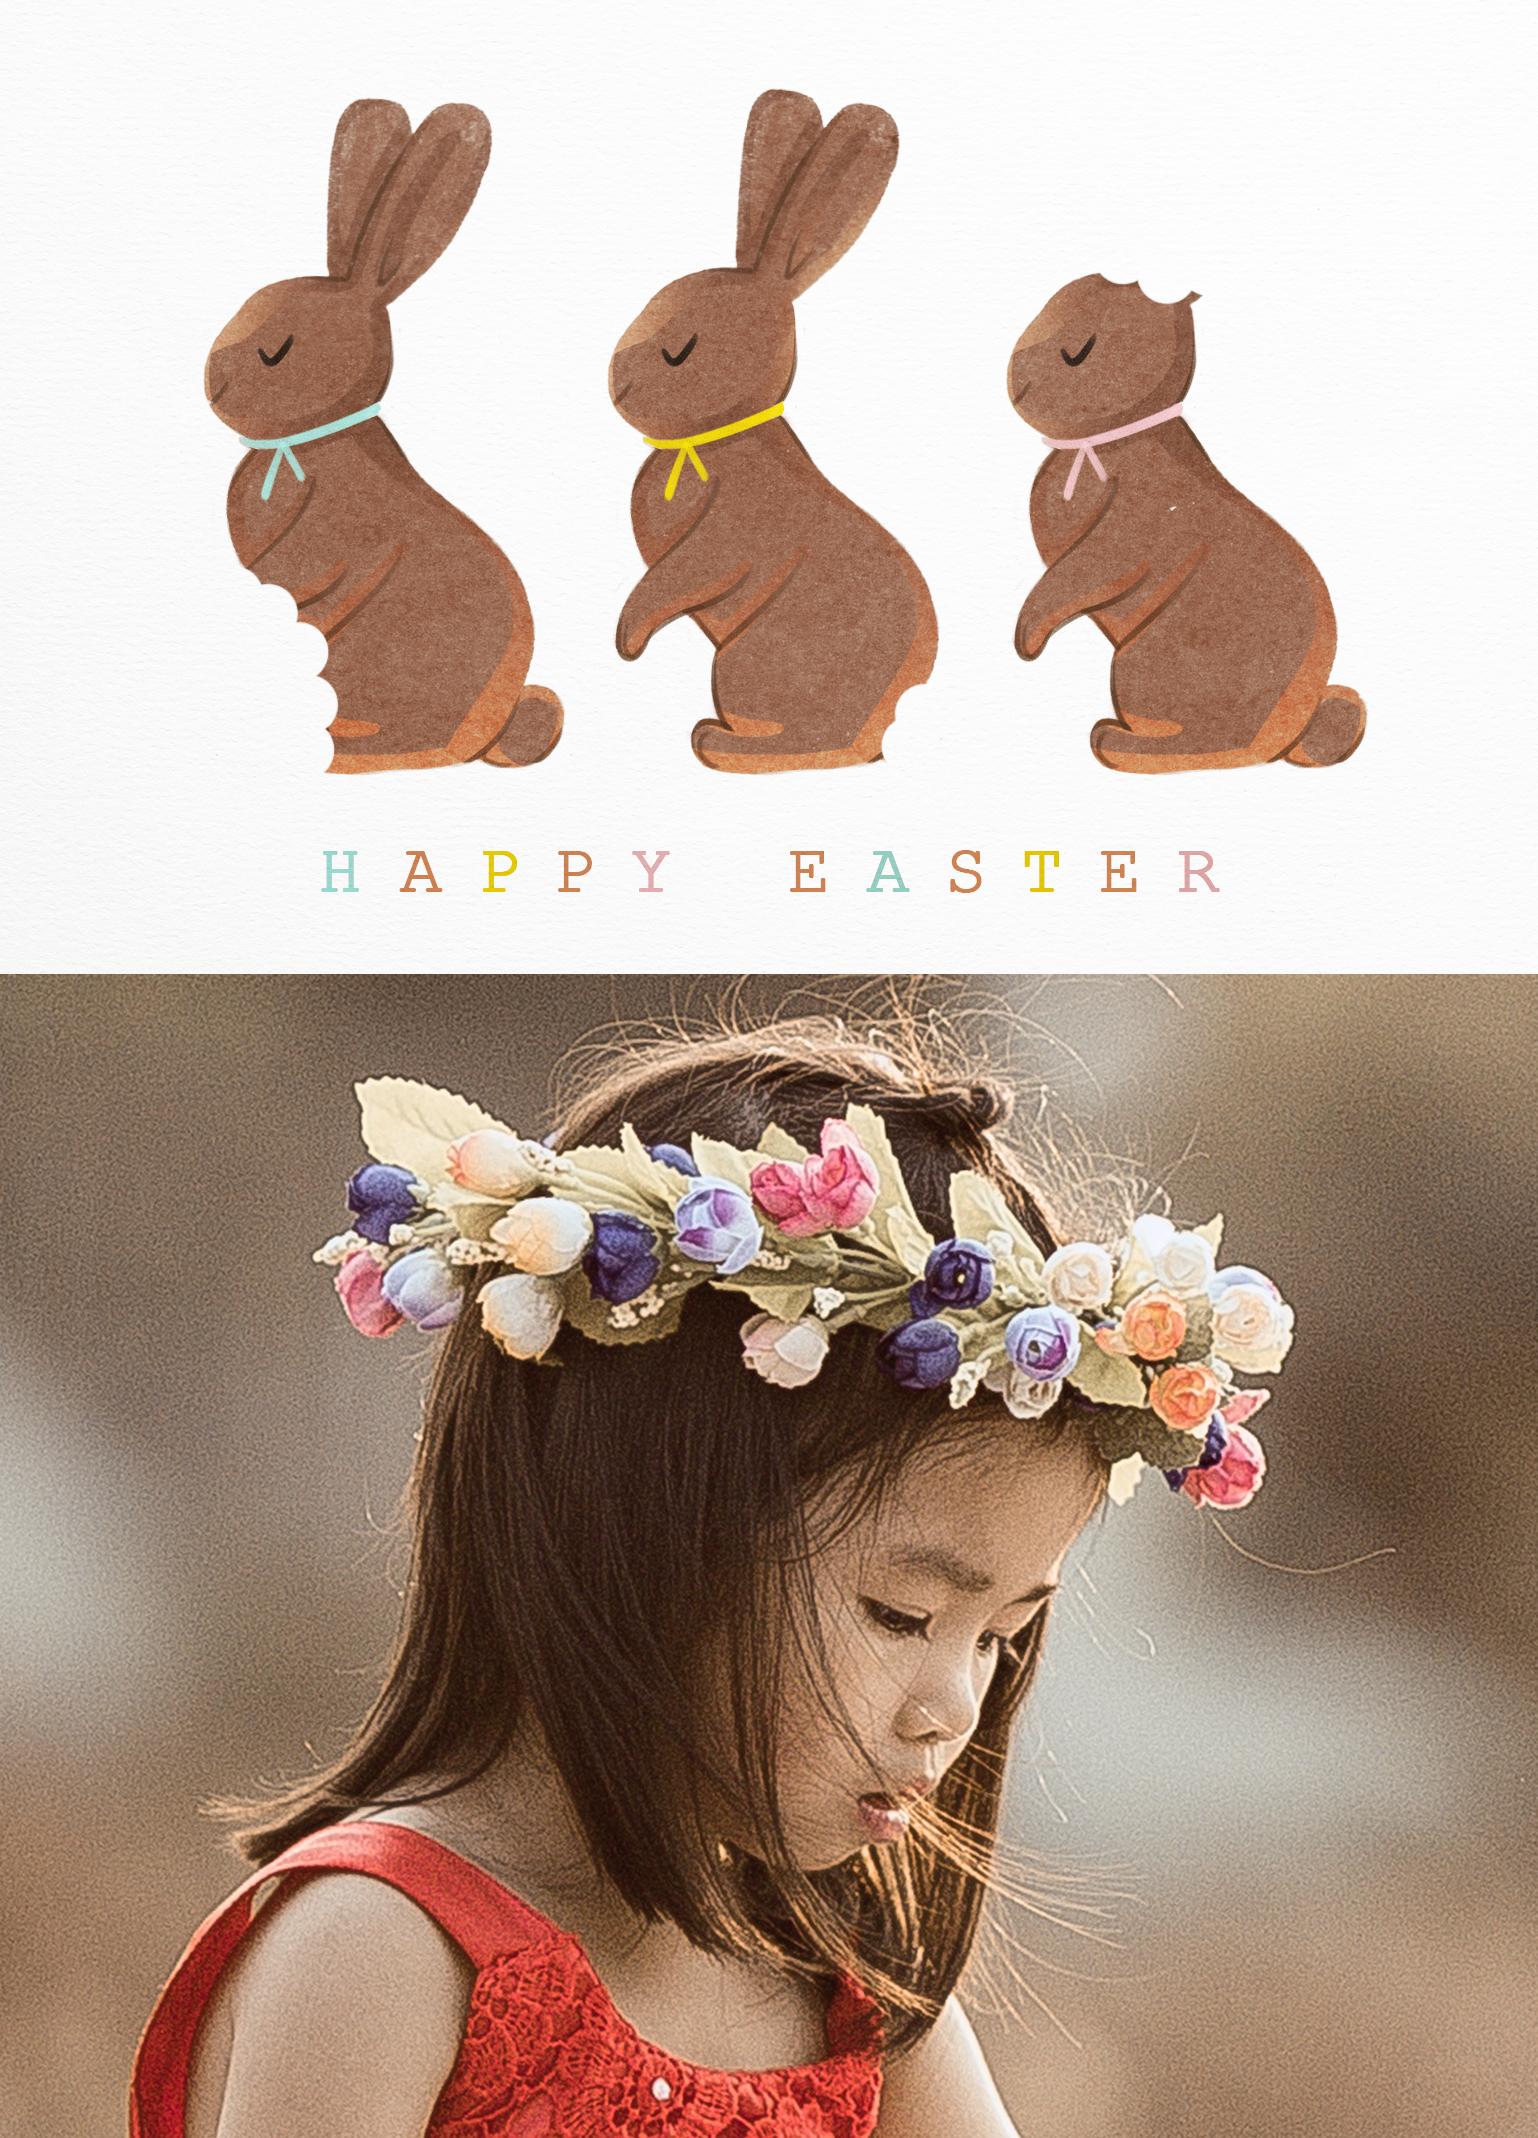 17 easter chocolatebunnies 1 front p